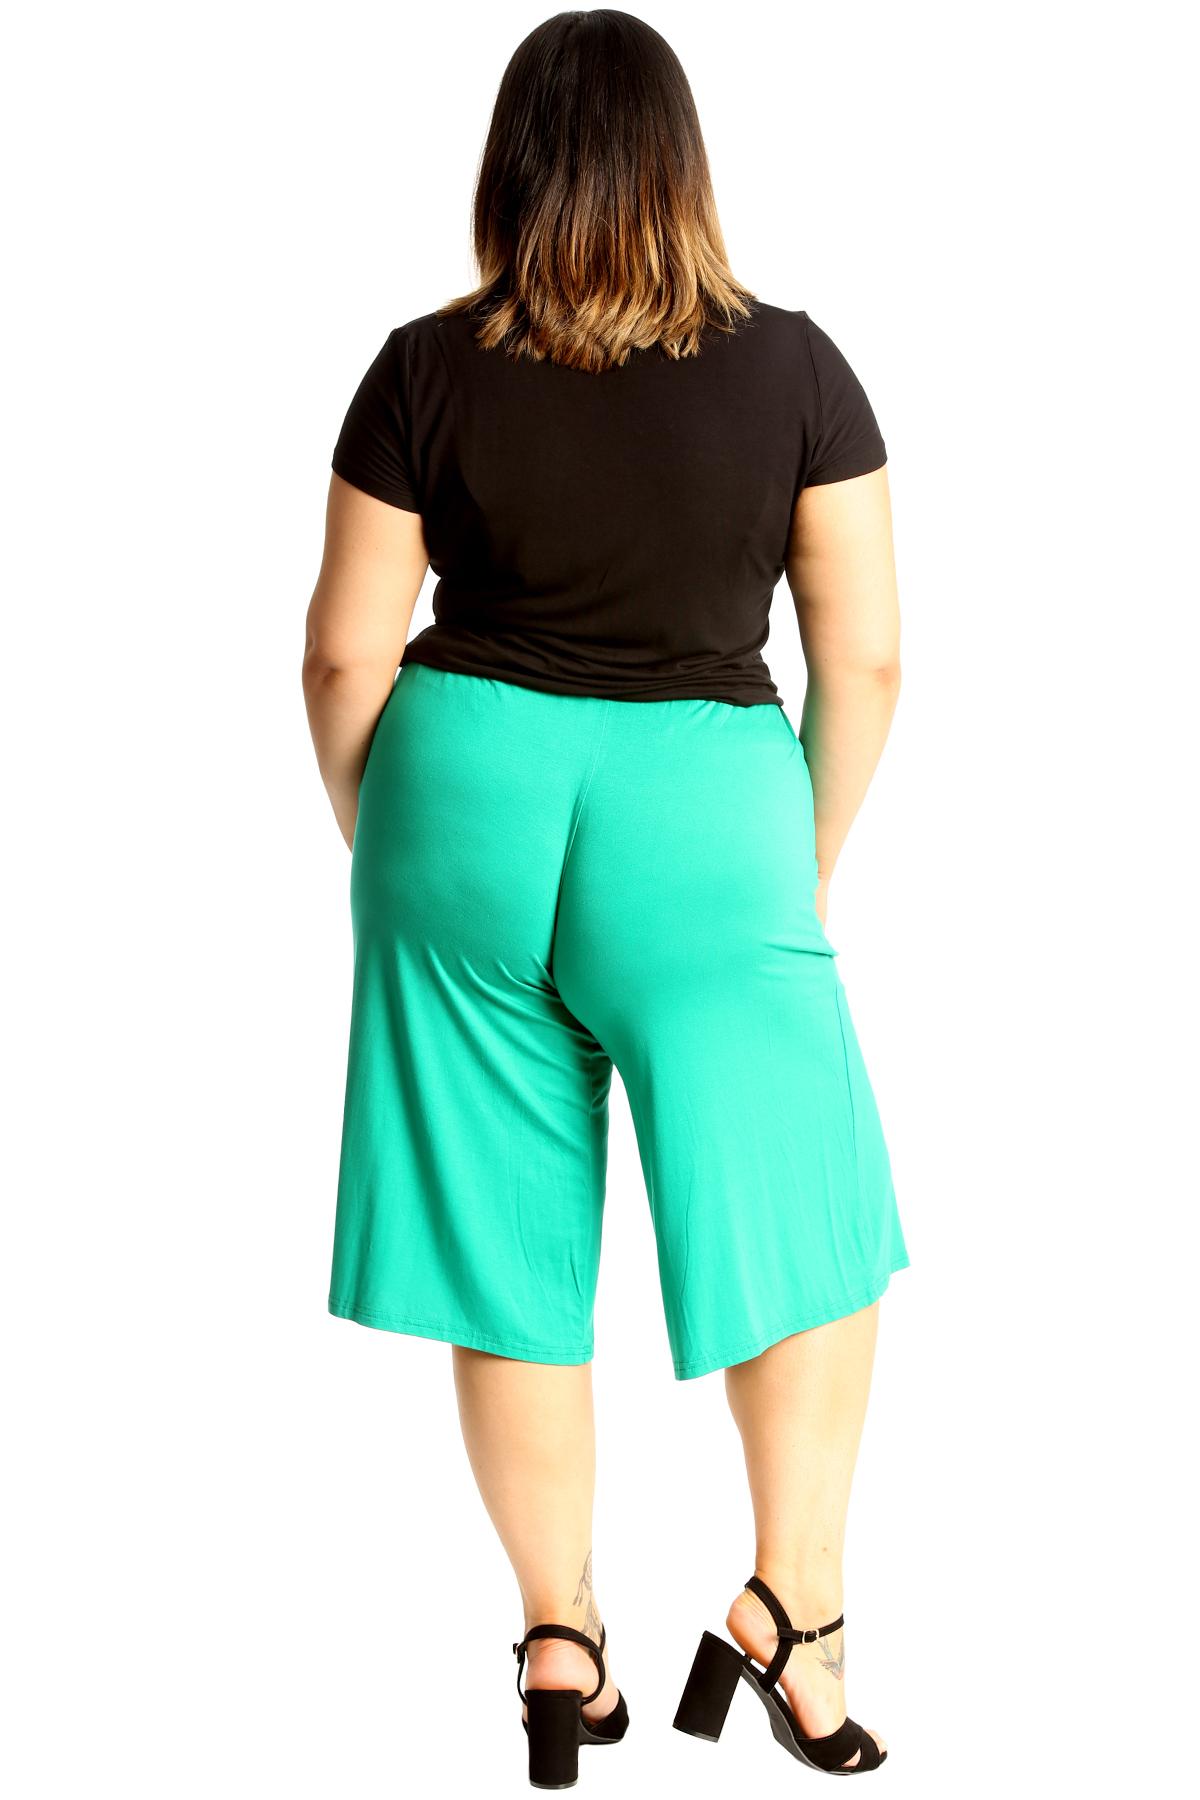 New-Womens-Plus-Size-Culottes-Ladies-Plain-Shorts-Palazzo-Elastic-Pants-Summer thumbnail 52